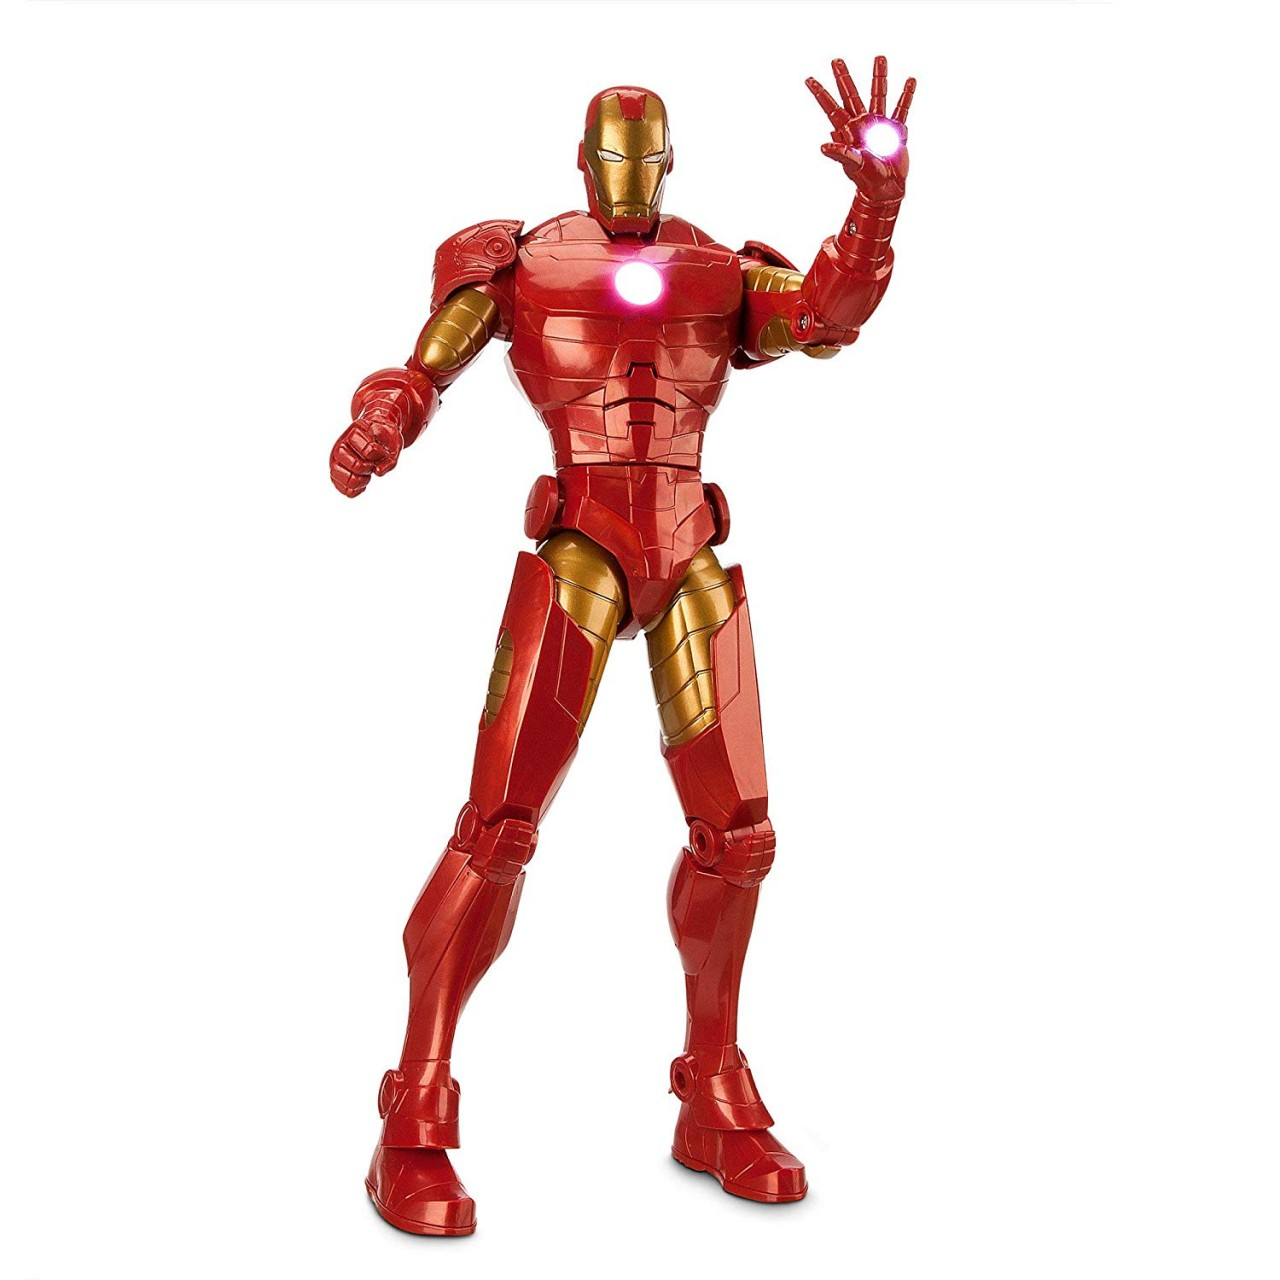 Интерактивная игрушка Disney - фигурка Железный человек